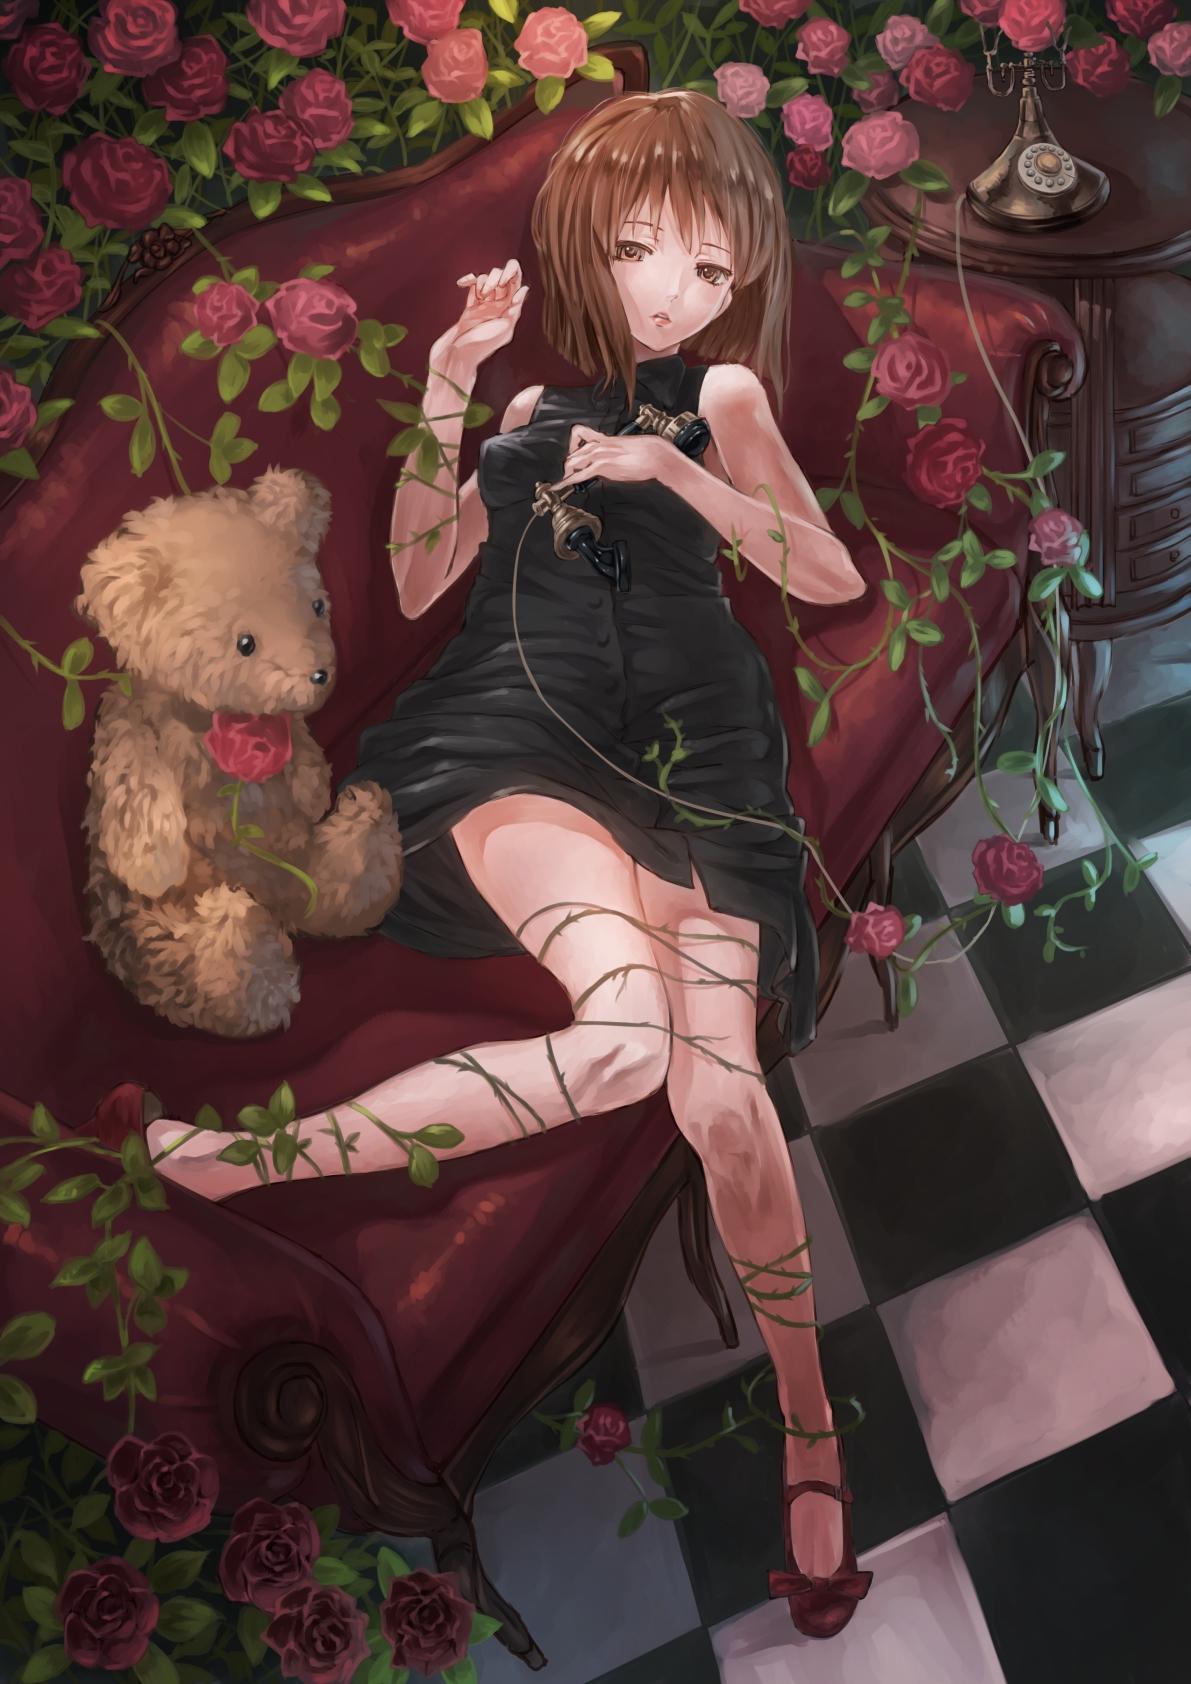 anime_wallpaper_Idol_Master_hagiwara_yukiho_id1236873-31359484.jpg